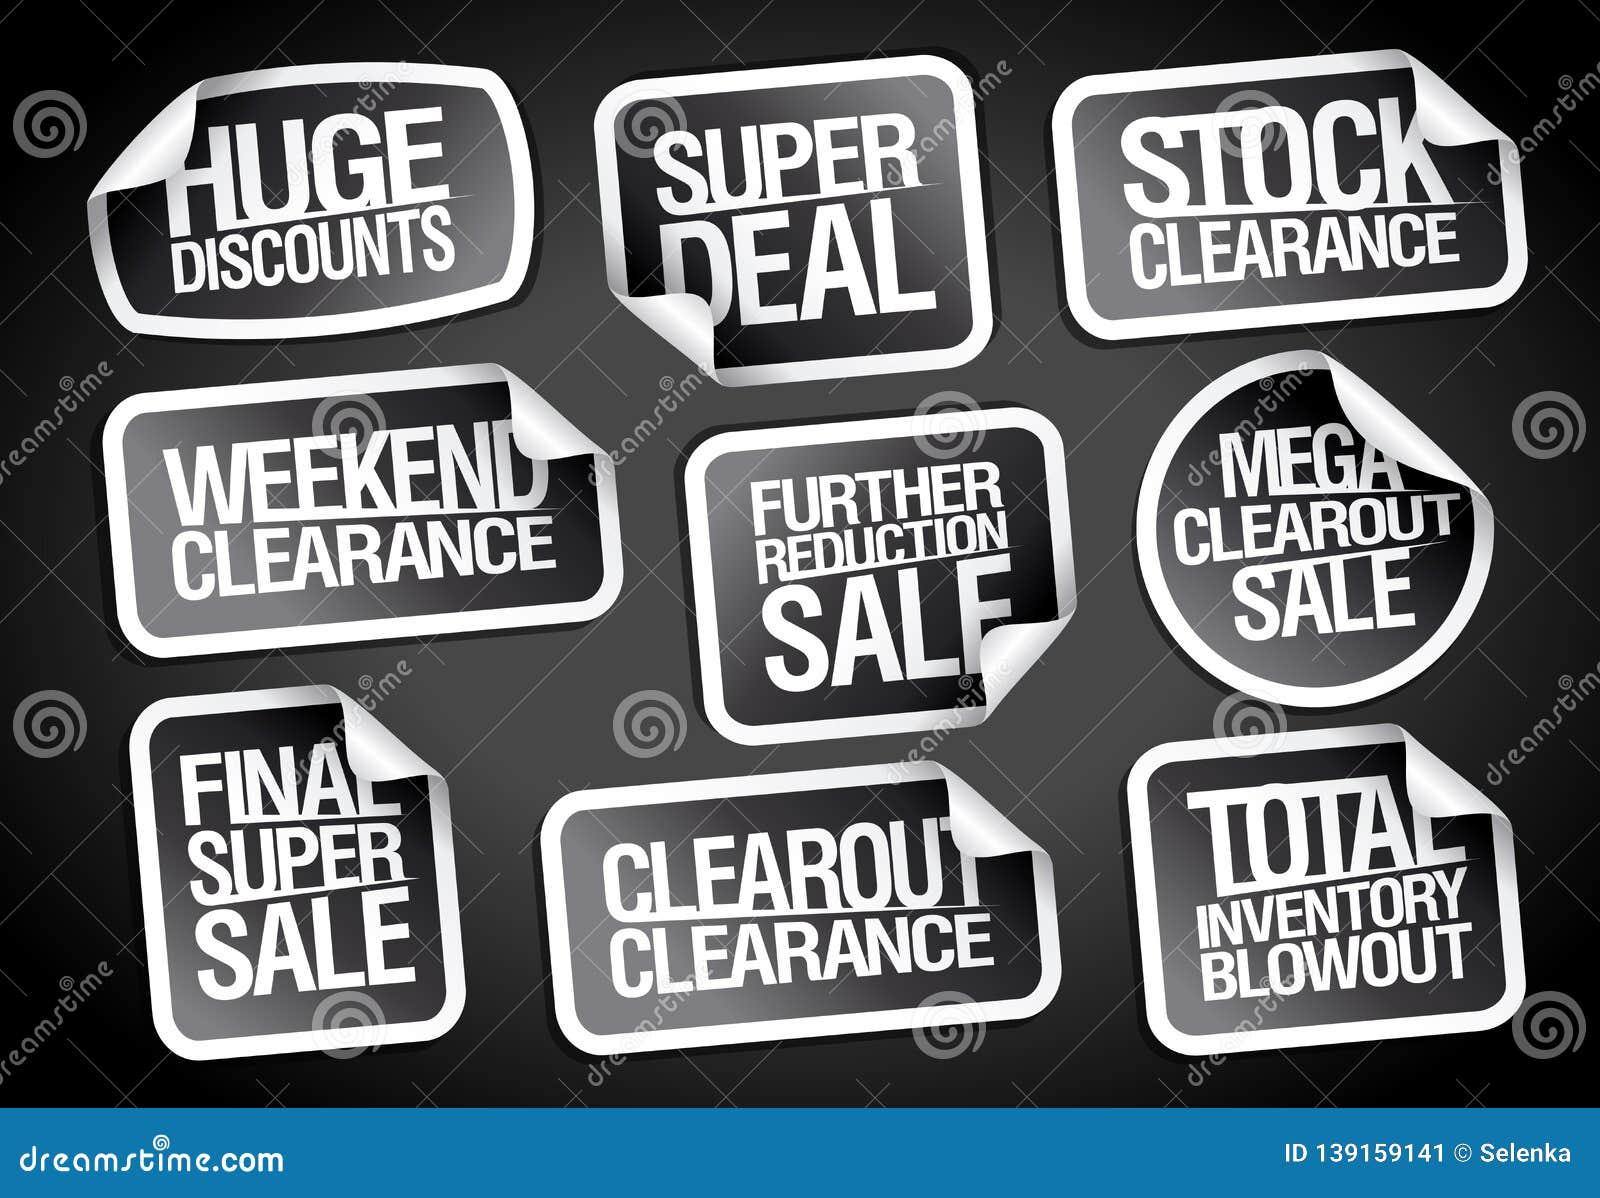 3e555894c23e76 Sale Stickers Collection - Huge Discounts